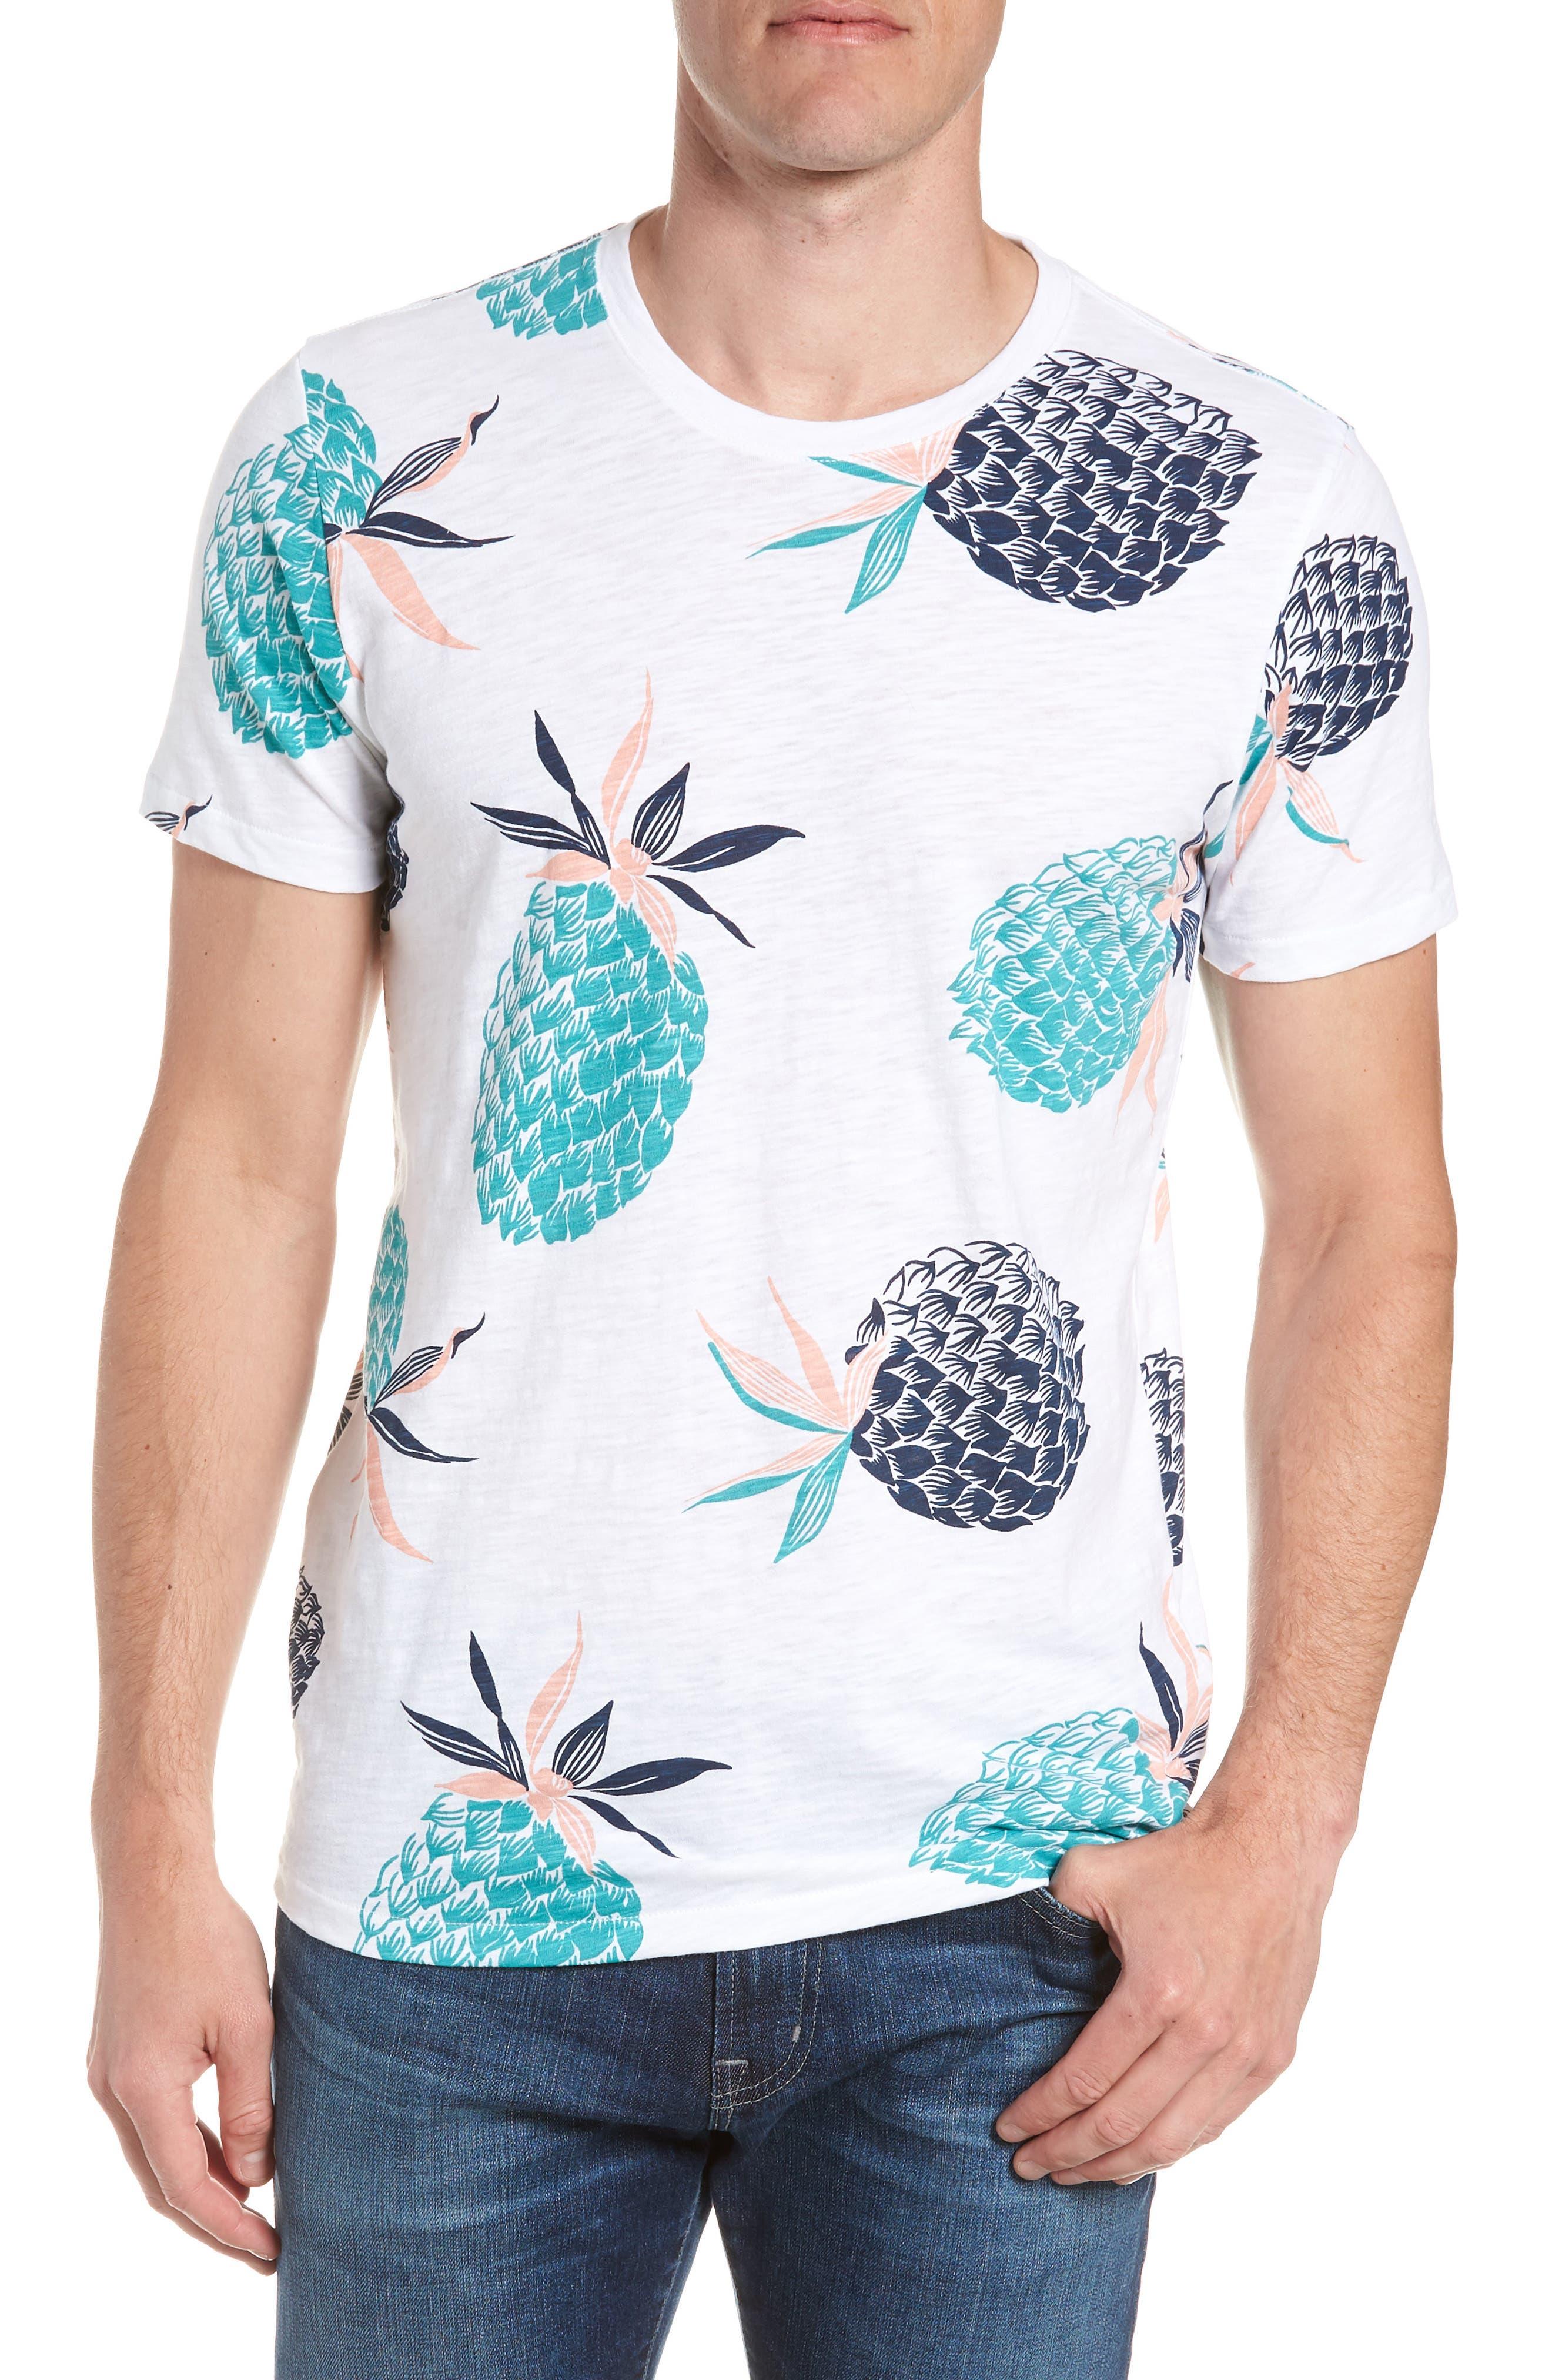 Pineapple Party Slim Fit T-Shirt,                             Main thumbnail 1, color,                             White/ Latigo Bay/ Sorbet